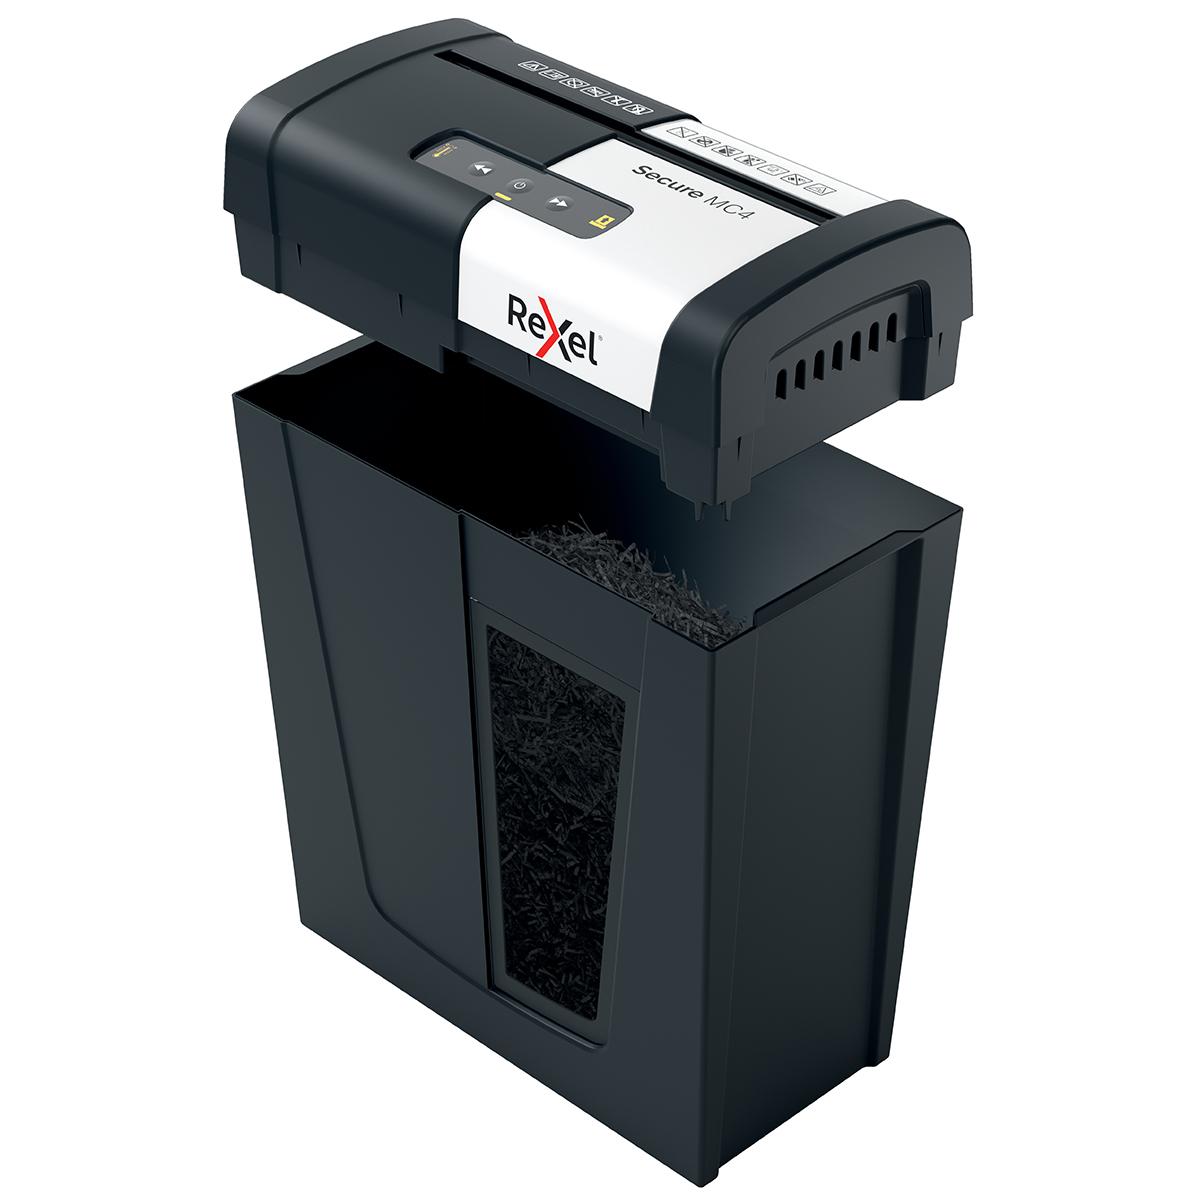 Rexel Secure MC4 Personal Micro cut Shredder